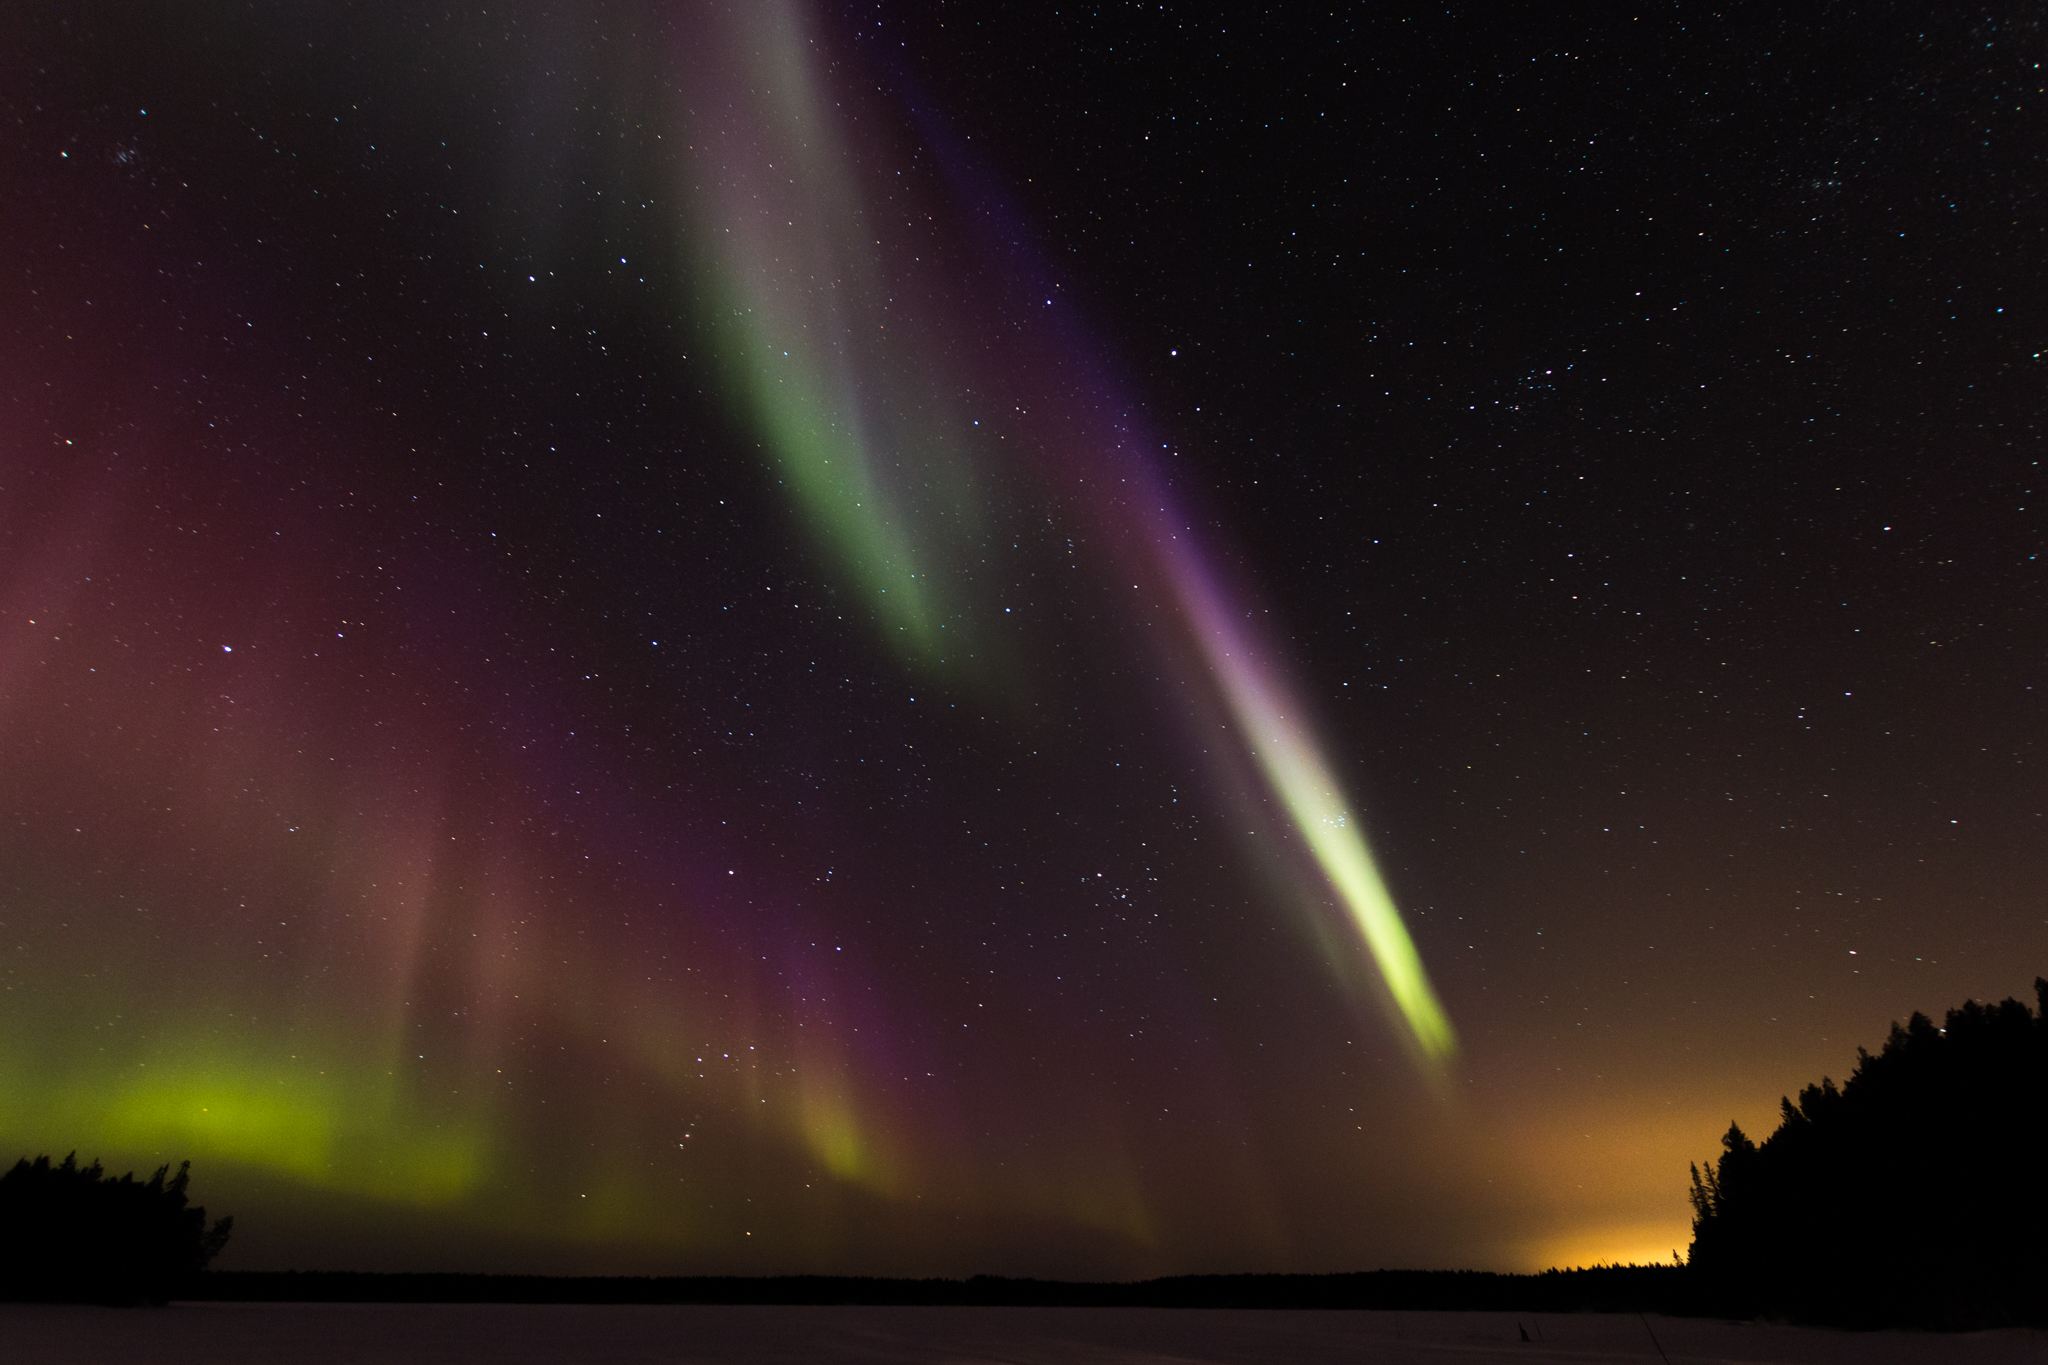 Northern Lights seen from Ollilian Lomamajat, Finland